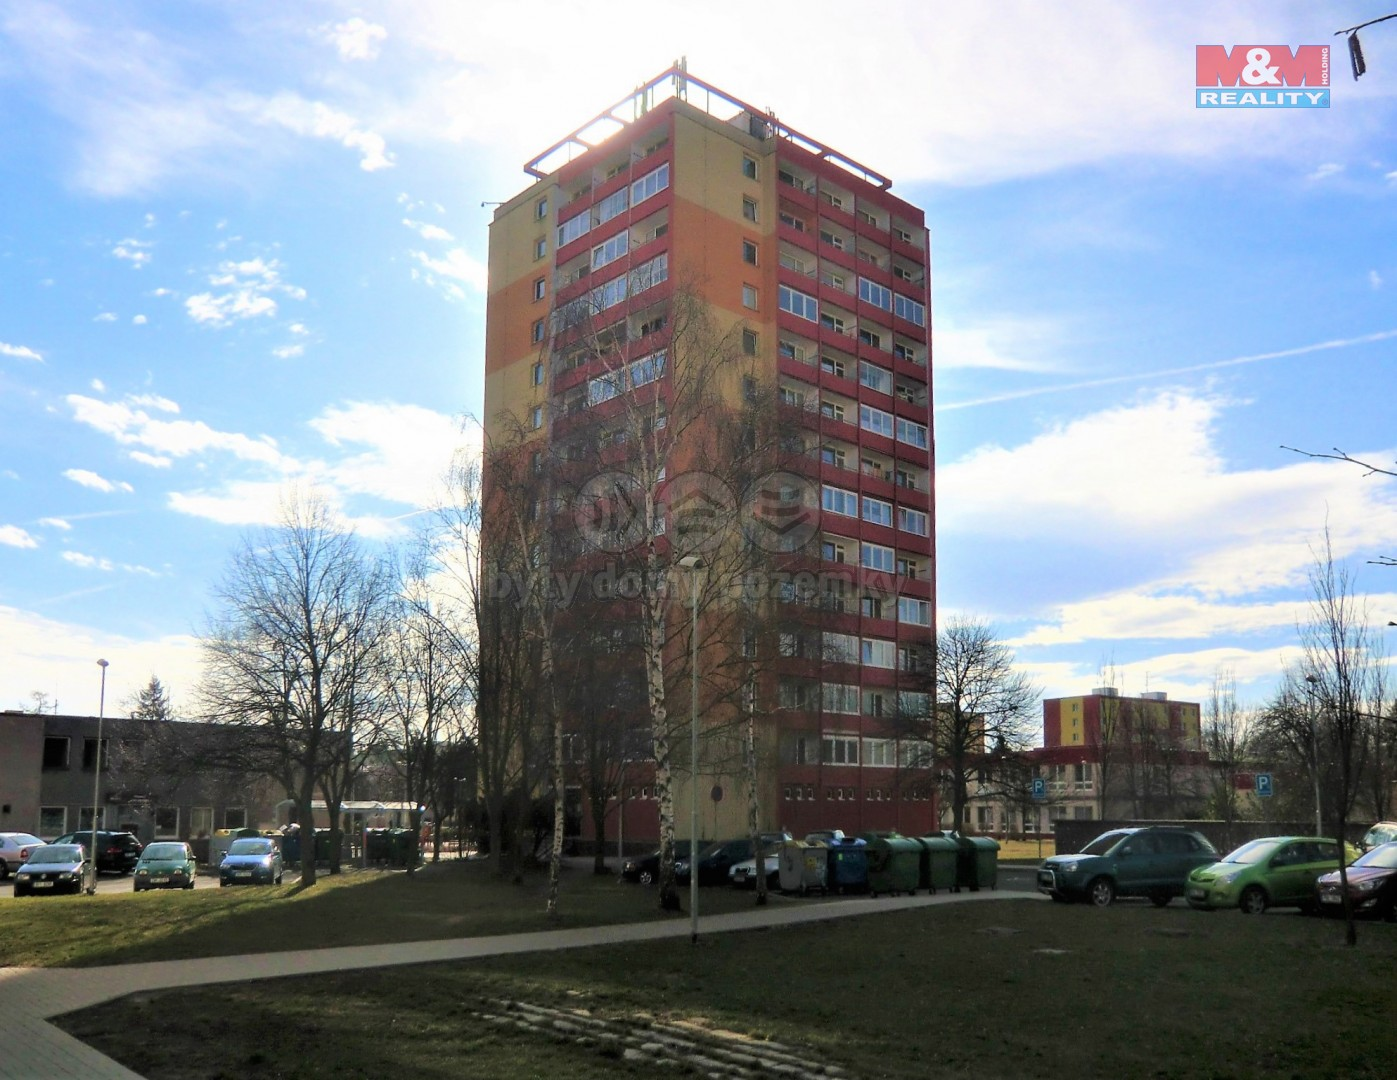 Dům (Prodej, byt 3+1, 61 m2, OV, Chomutov, ul. Seifertova), foto 1/15